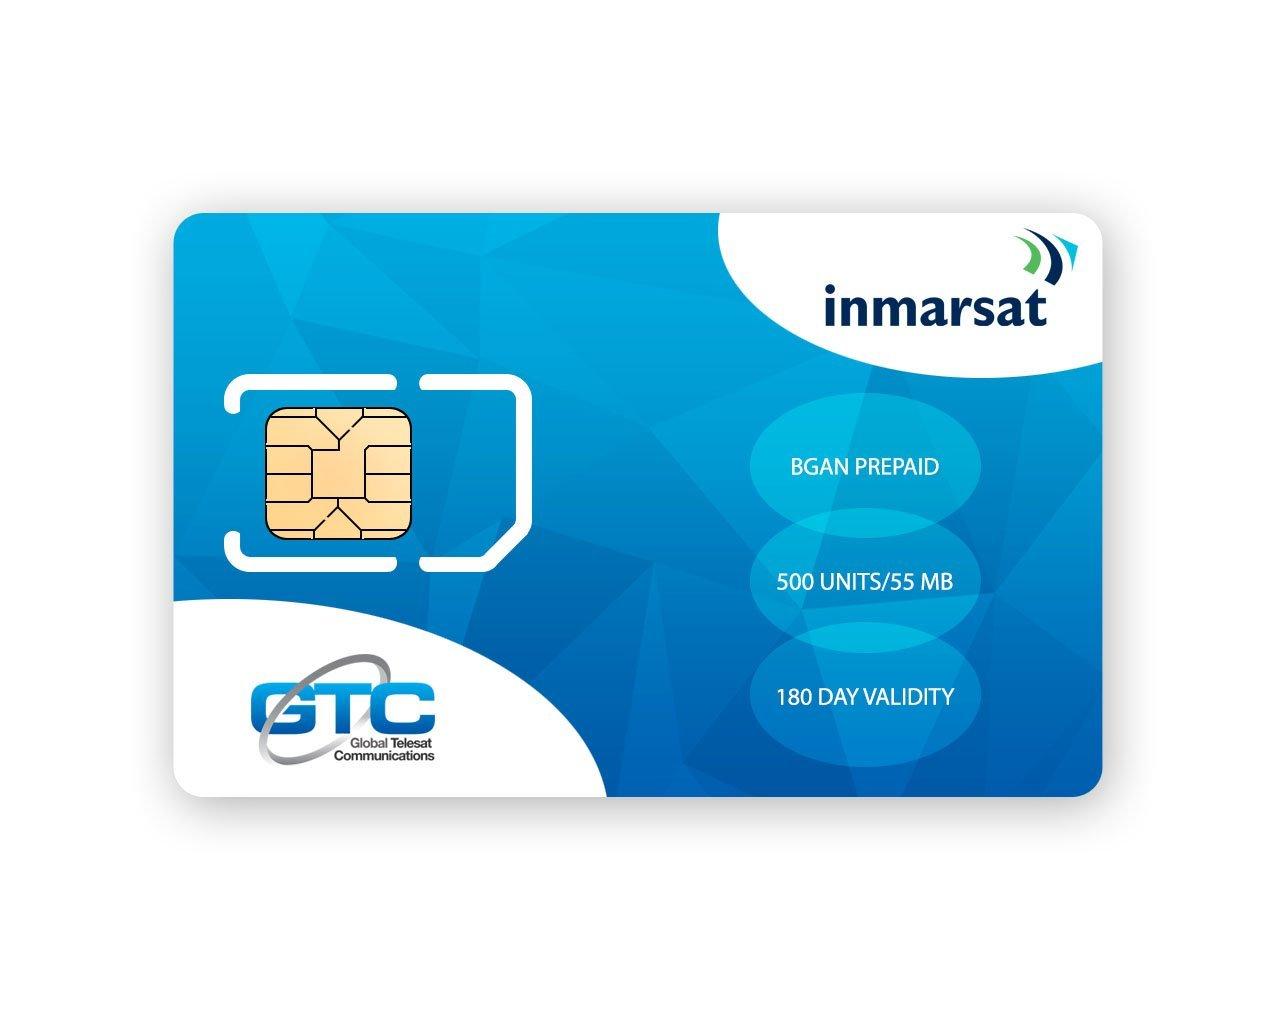 Inmarsat BGAN Prepaid SIM Card with 500 units (55.00MB*) valid for 180 days By GTC